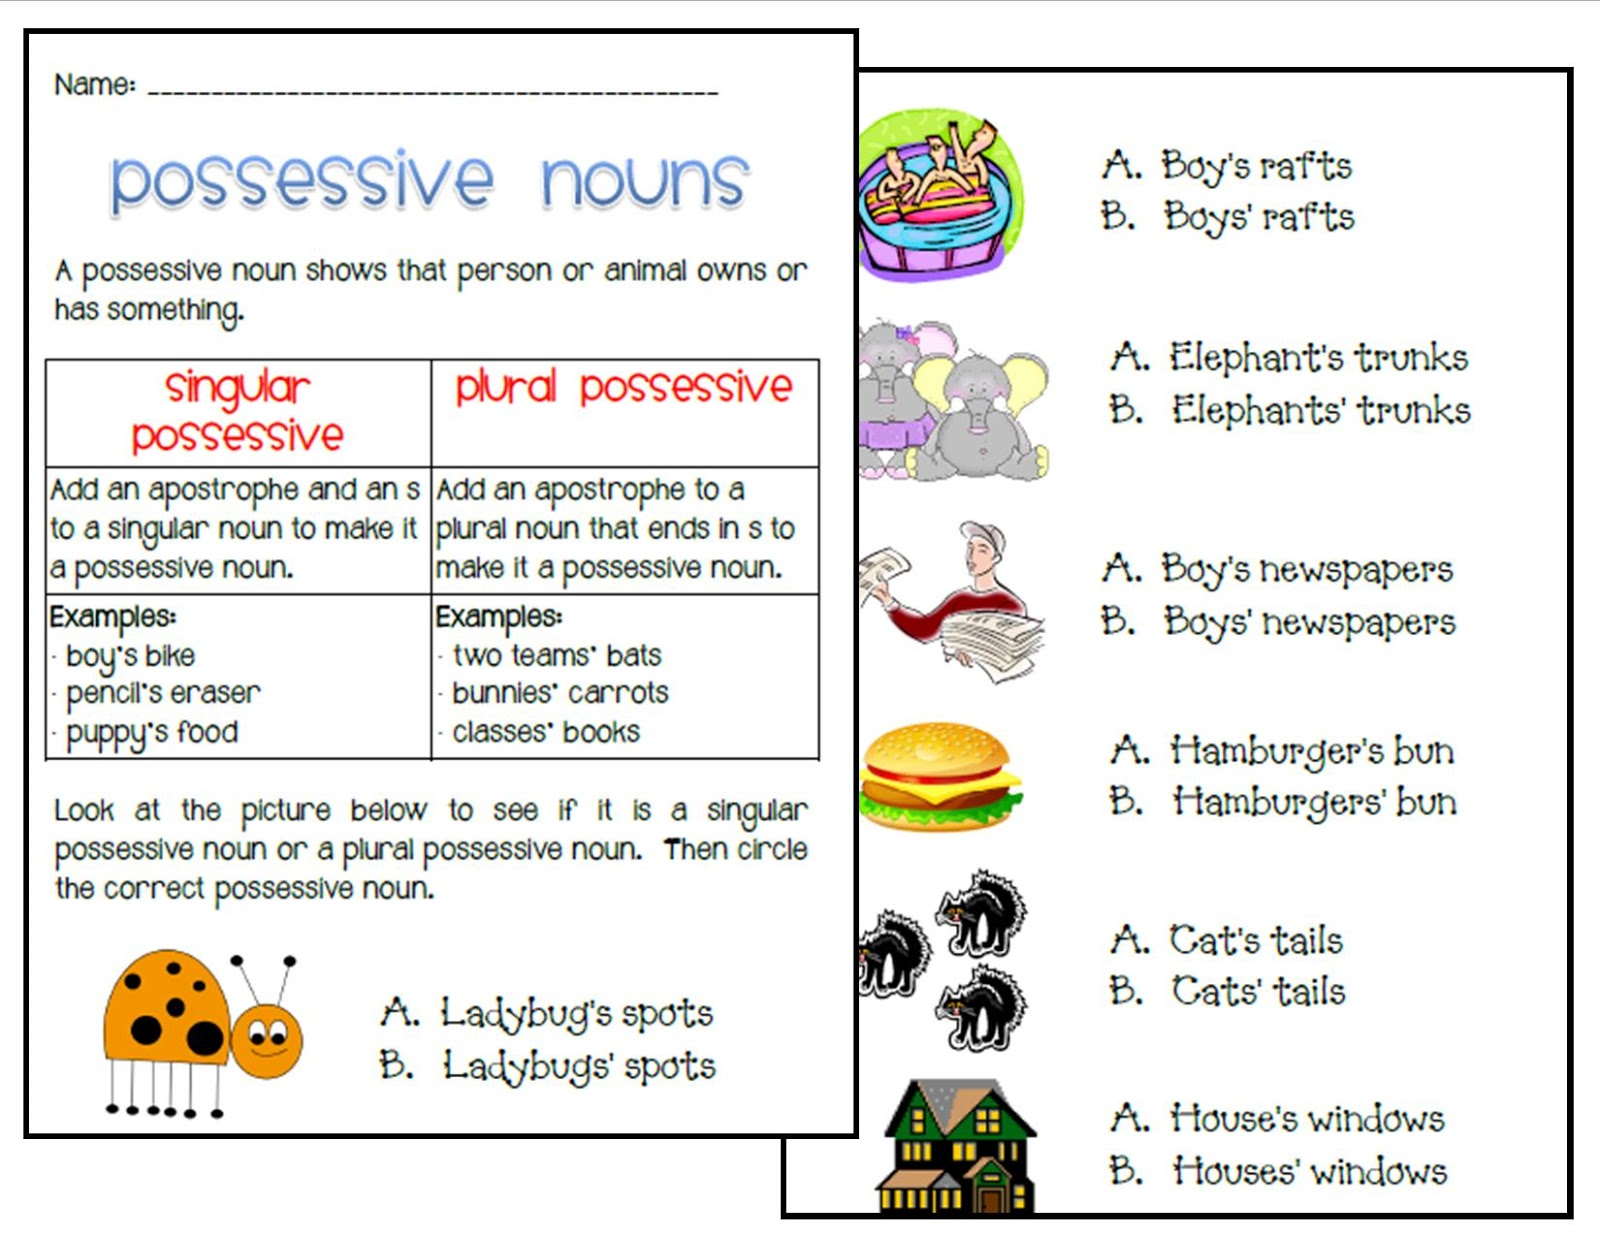 hight resolution of Possessive Nouns - Lessons - Blendspace